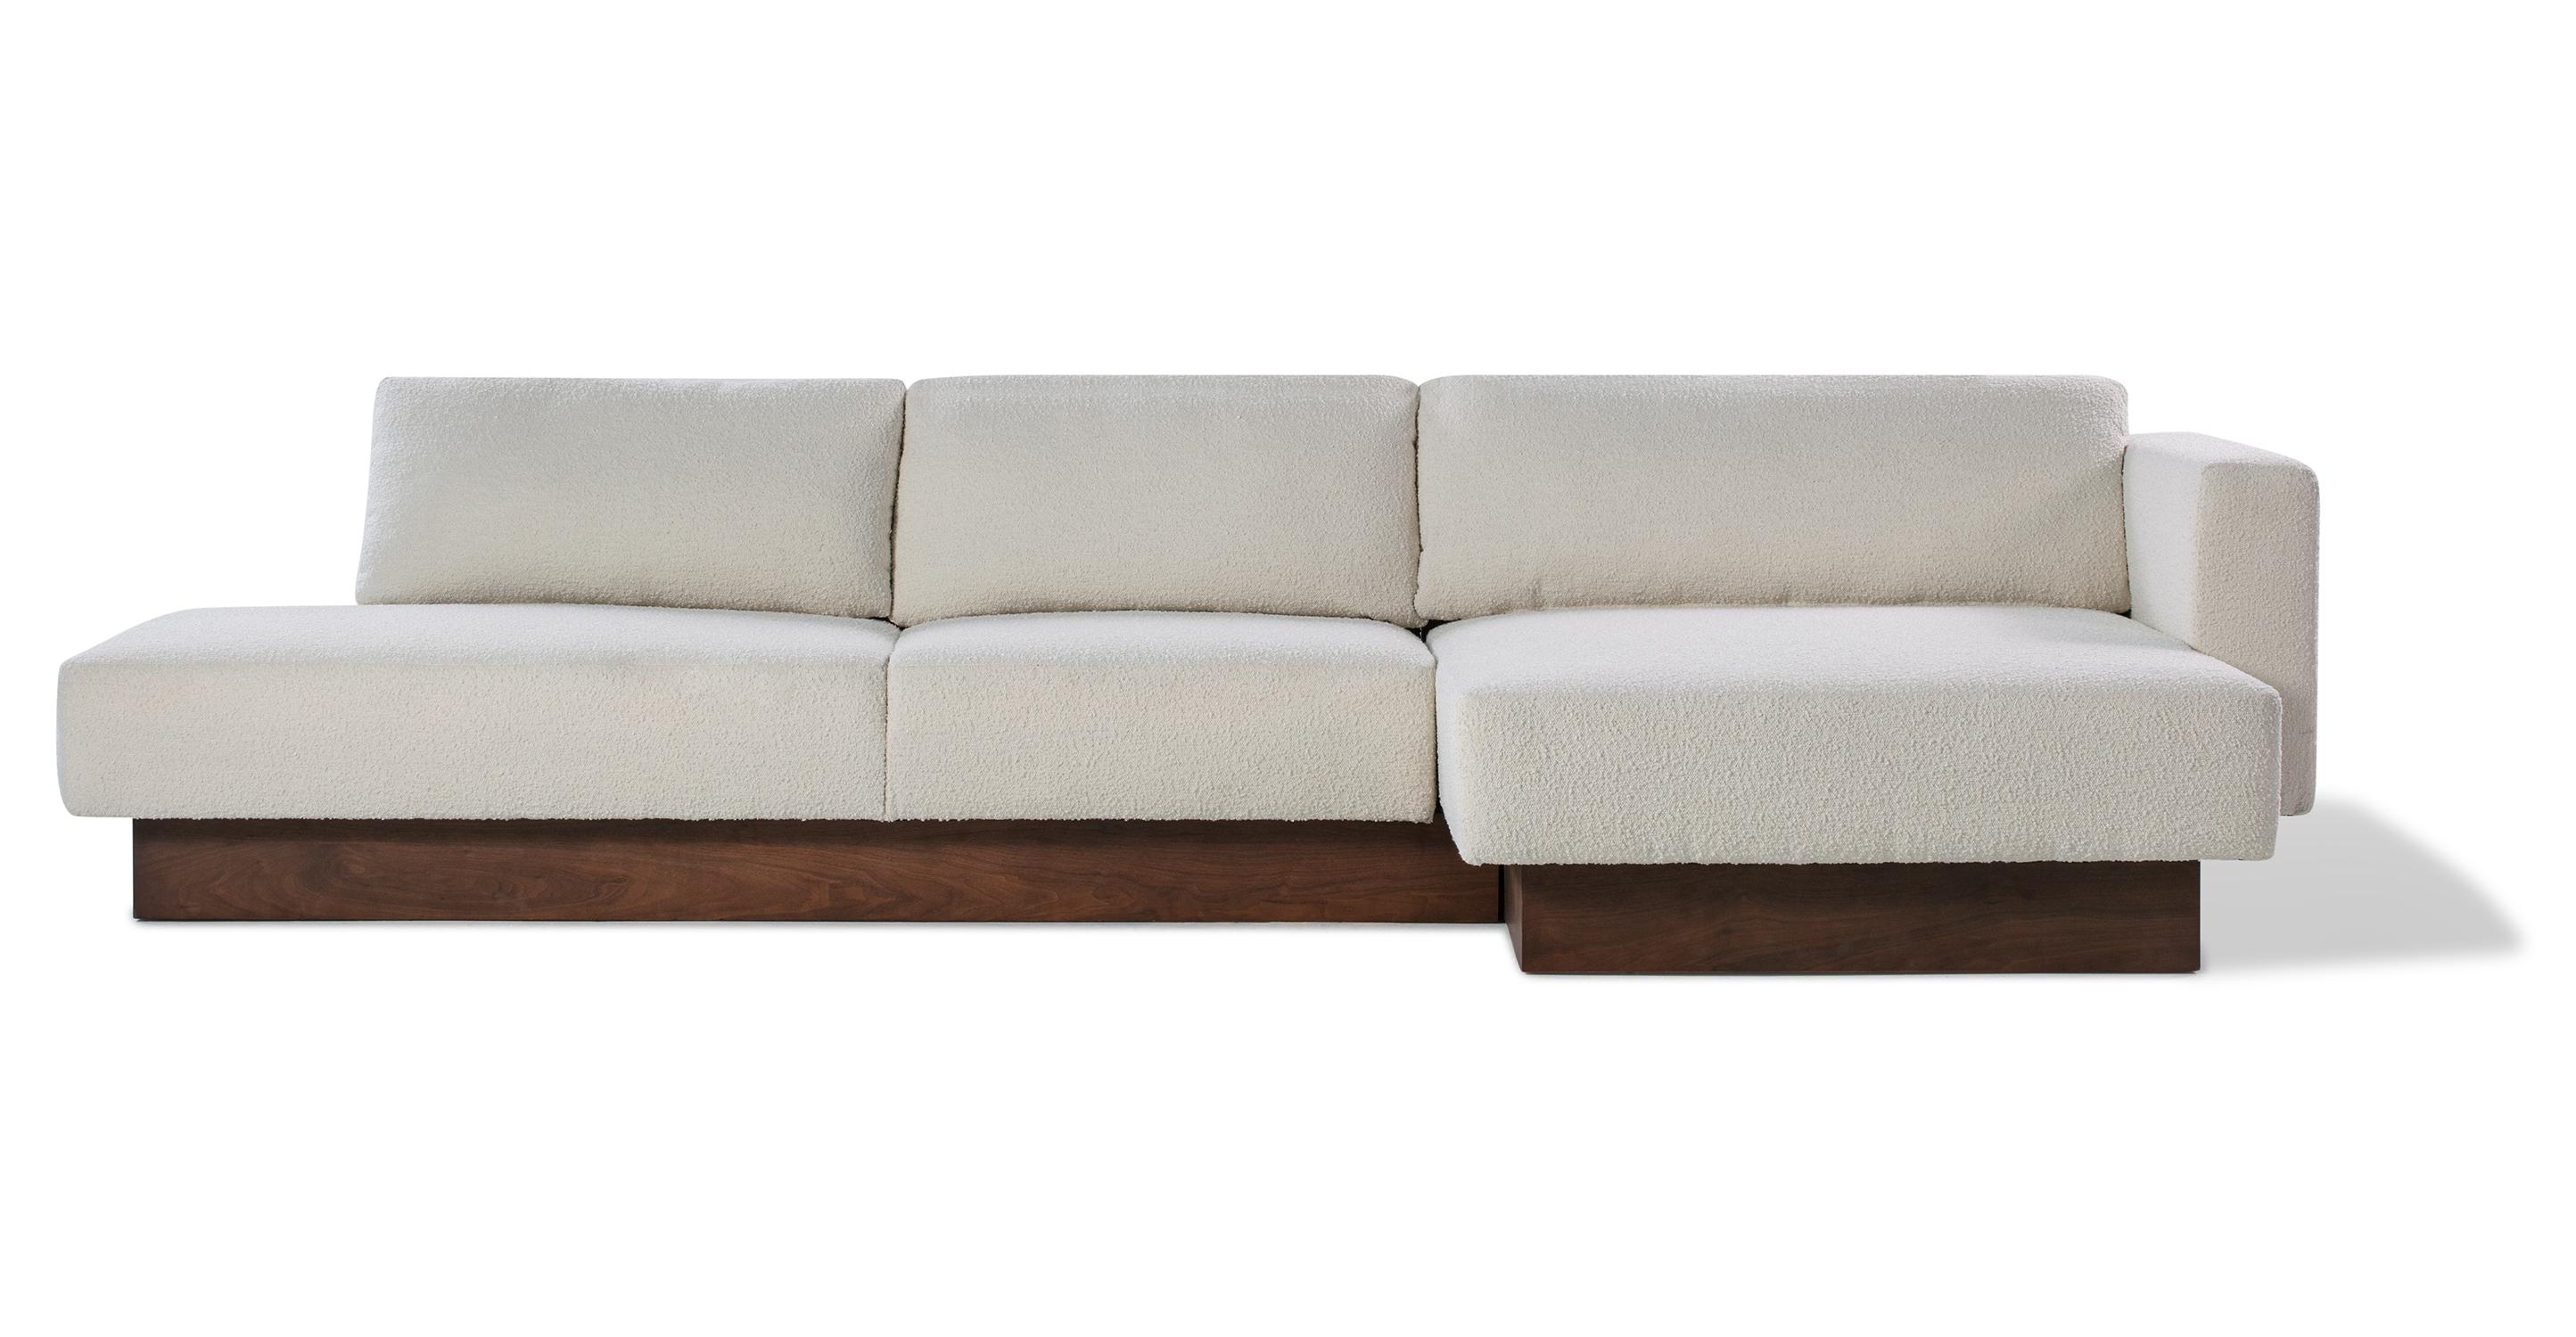 "Brady 128"" Fabric Sofa Sectional Right, Blanc Boucle"